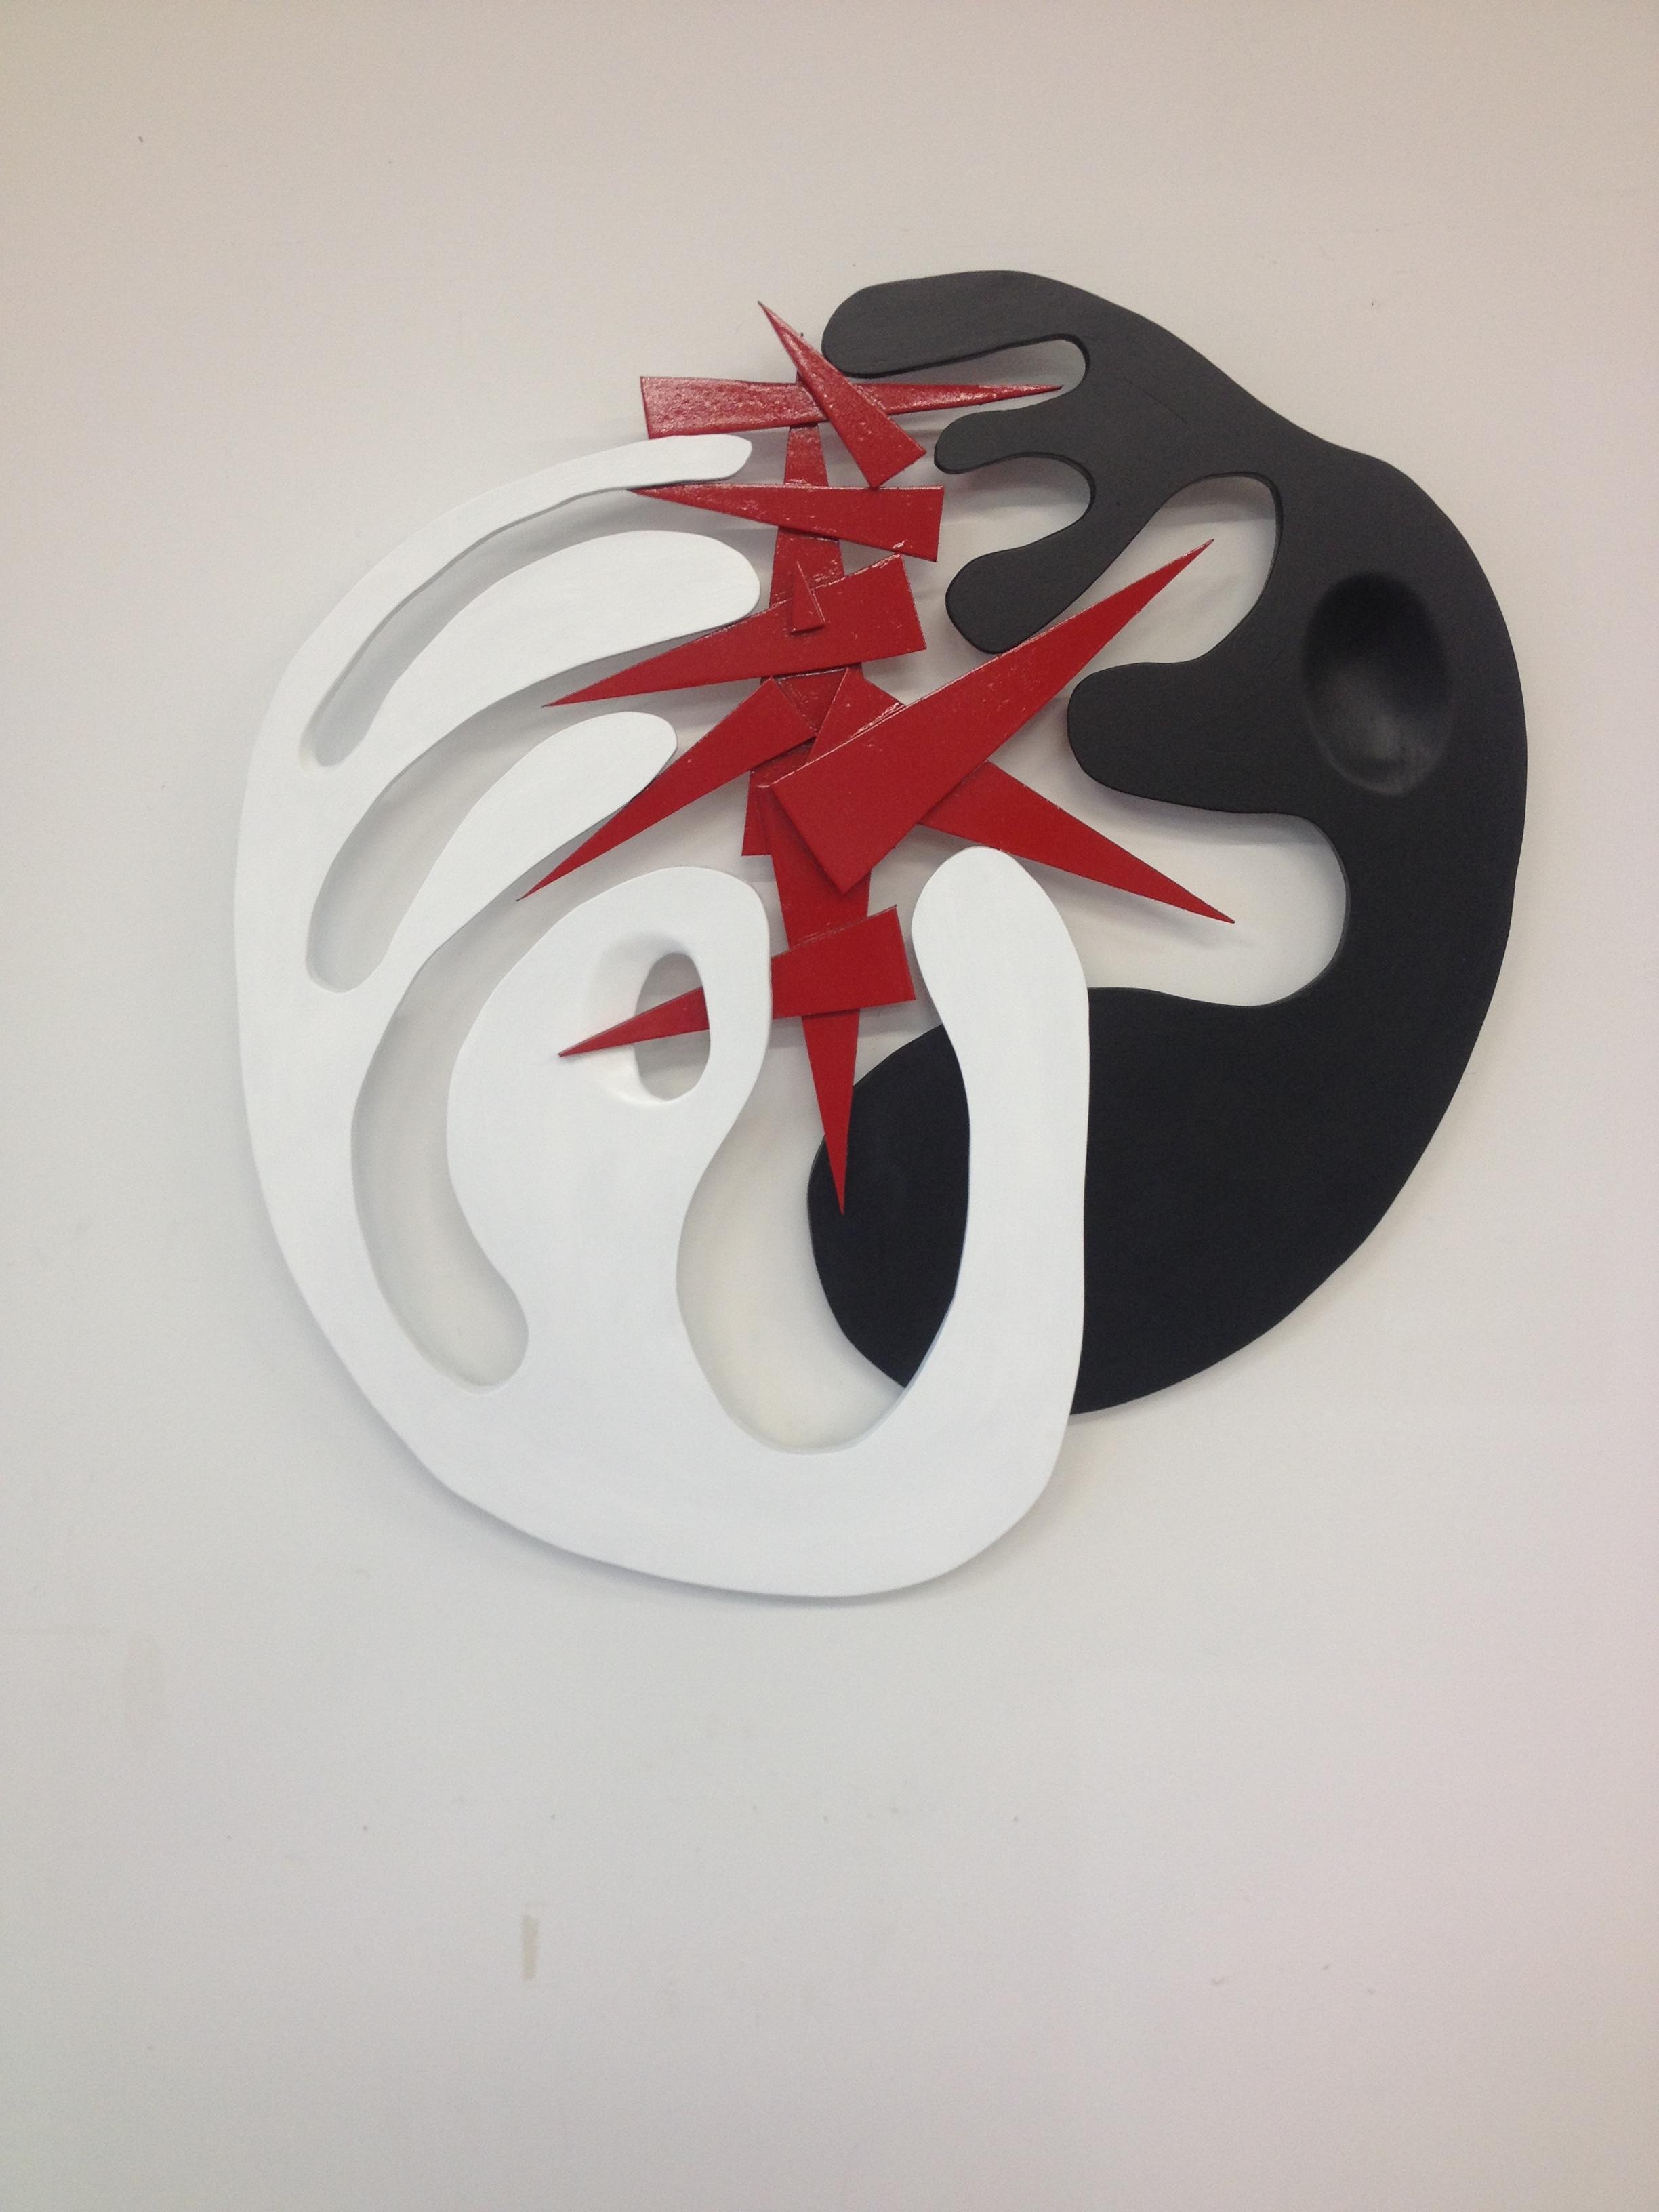 Hands (Of The Sculptor)